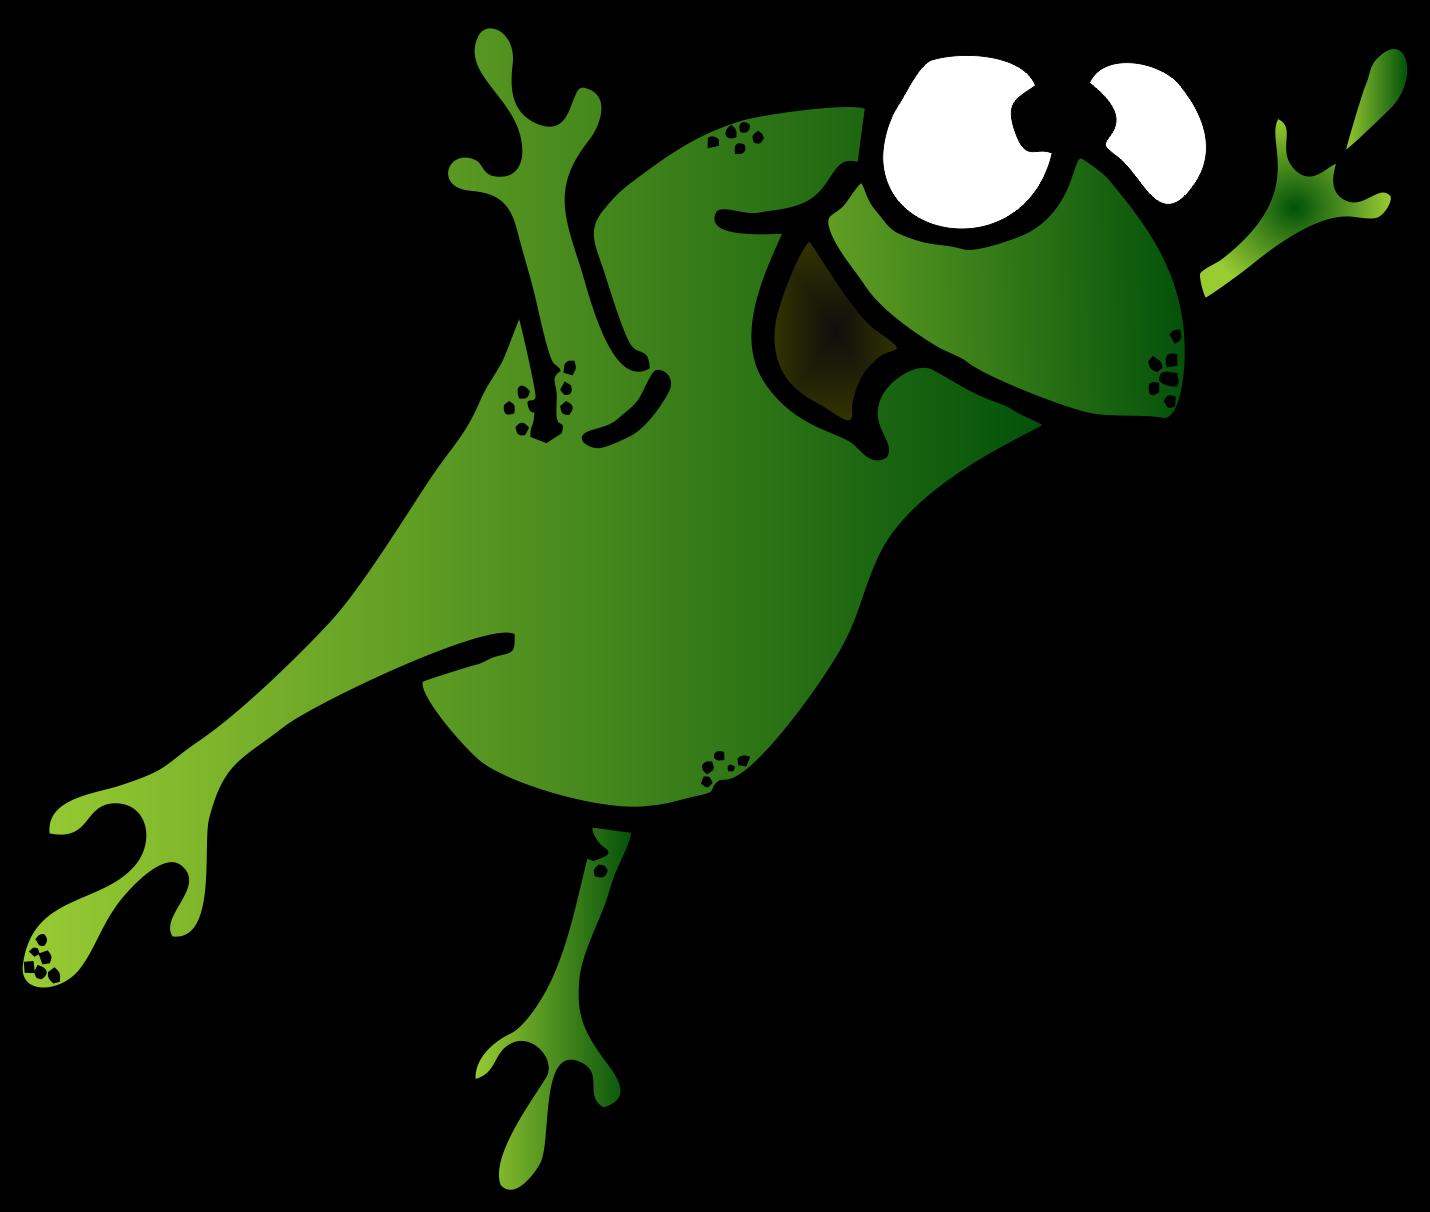 Worksheetjunkie cvc freebies hop. Hops clipart frog